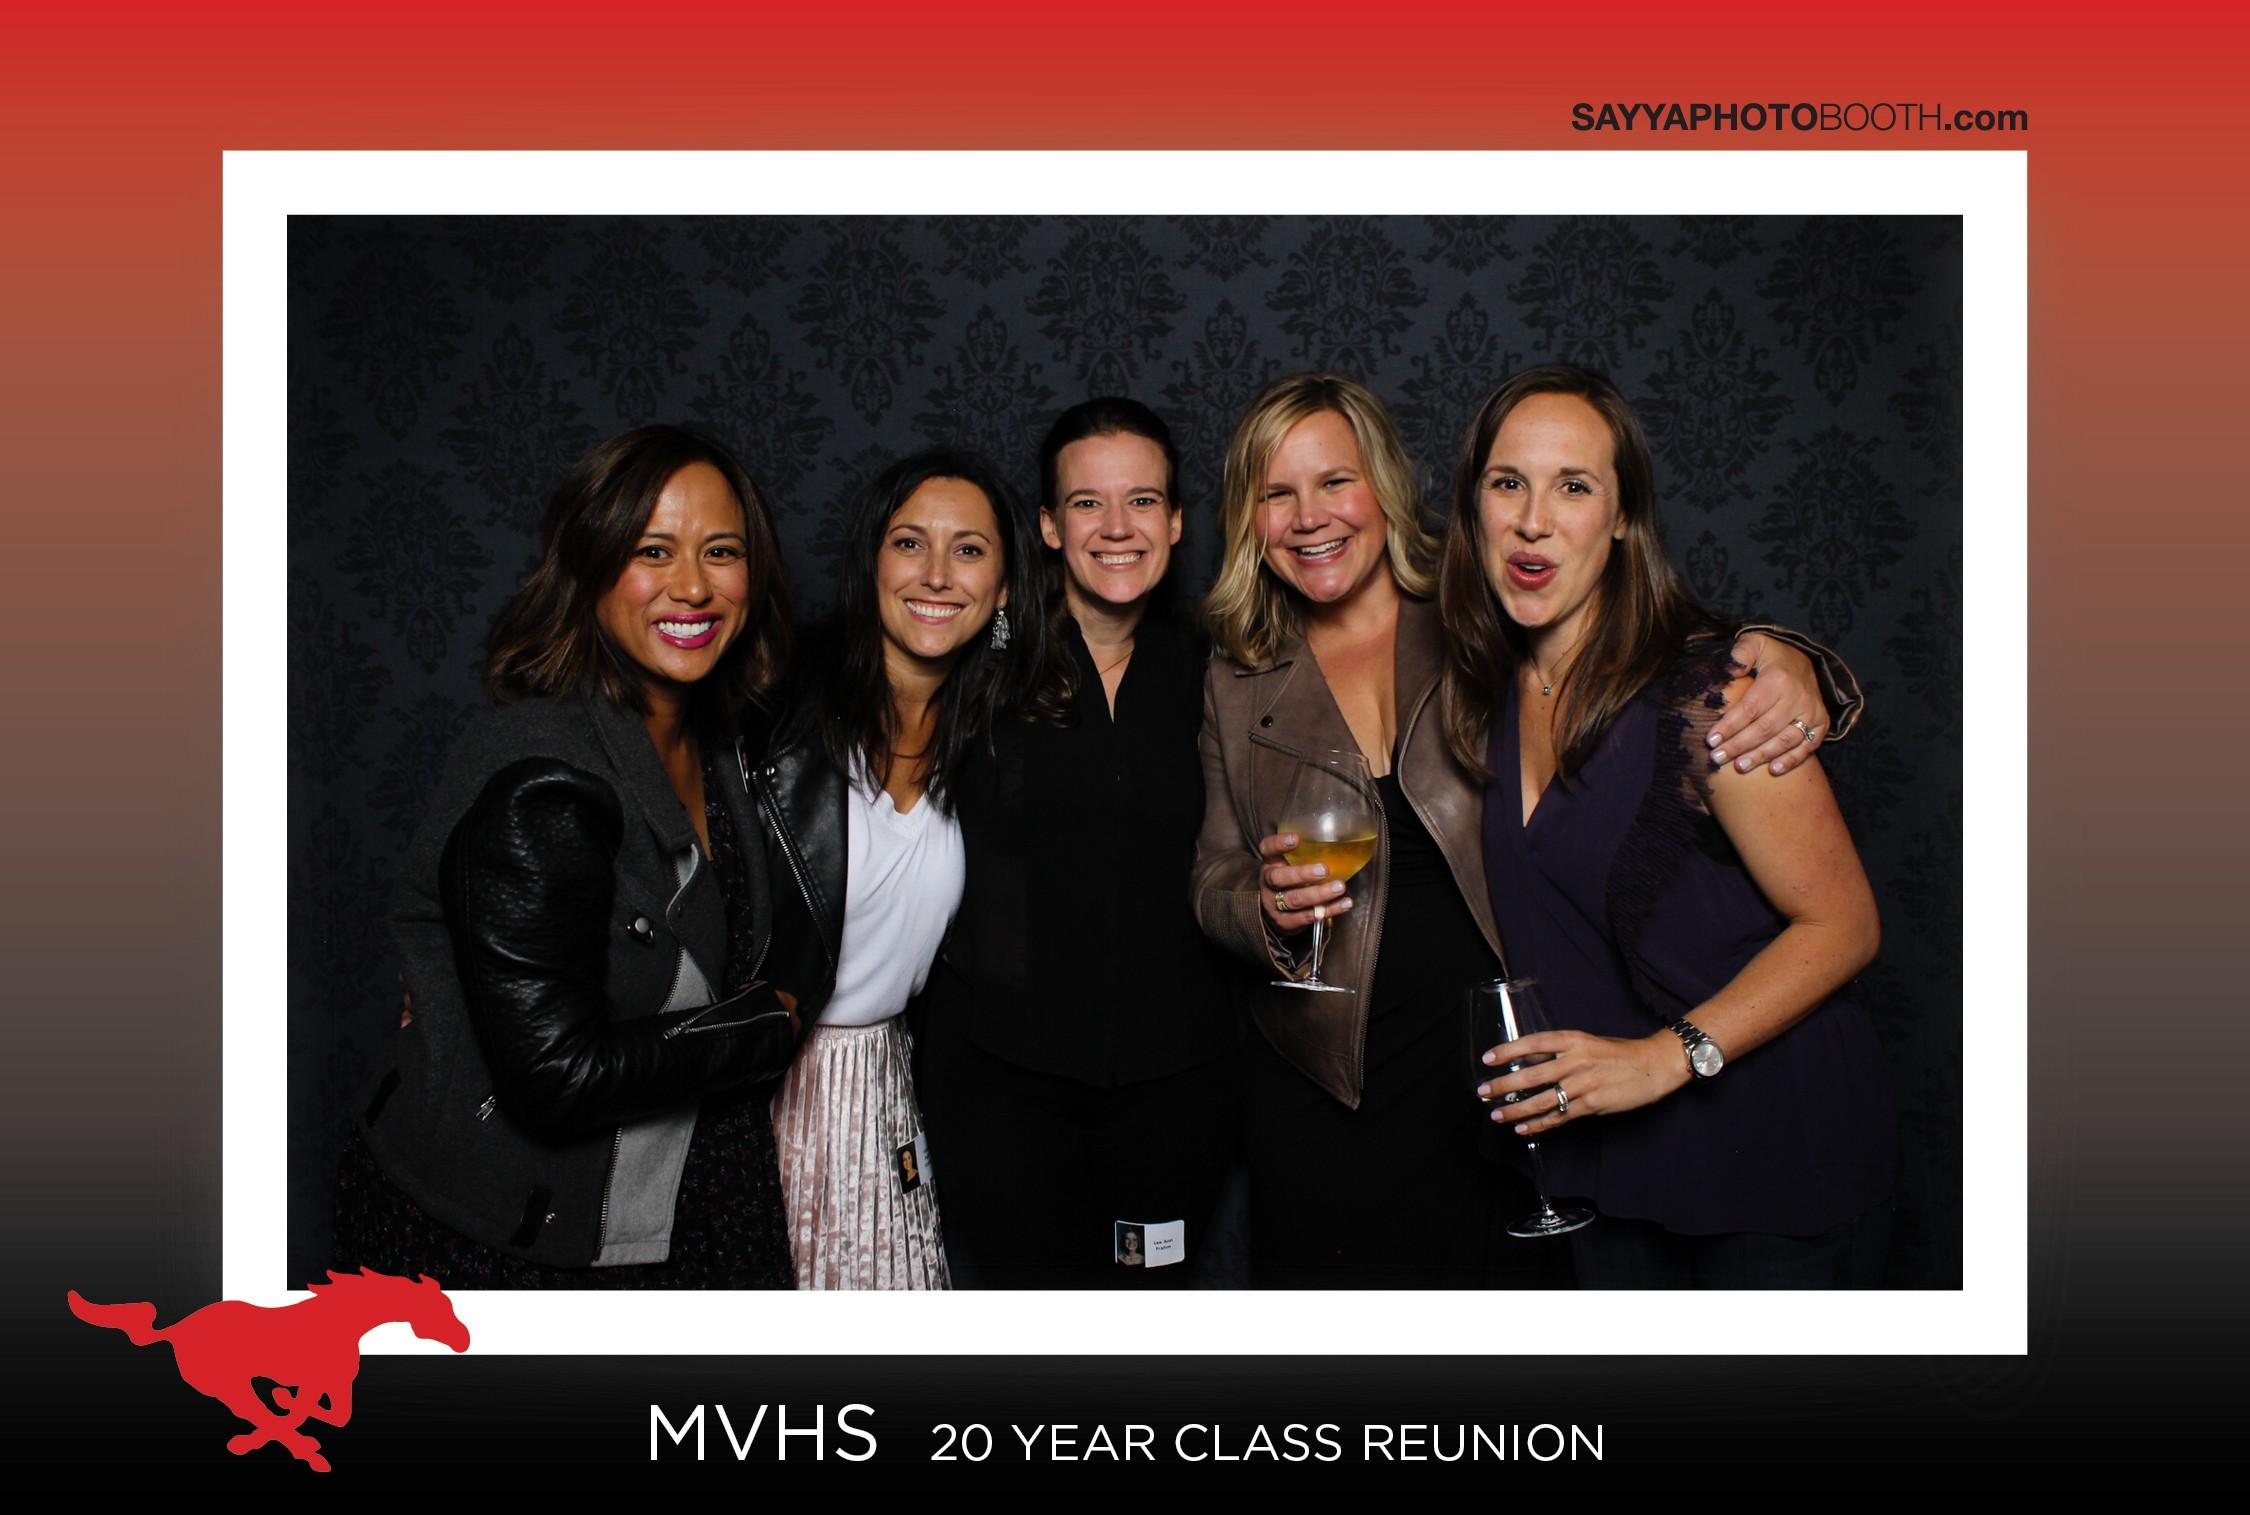 MVHS 20 Year Reunion